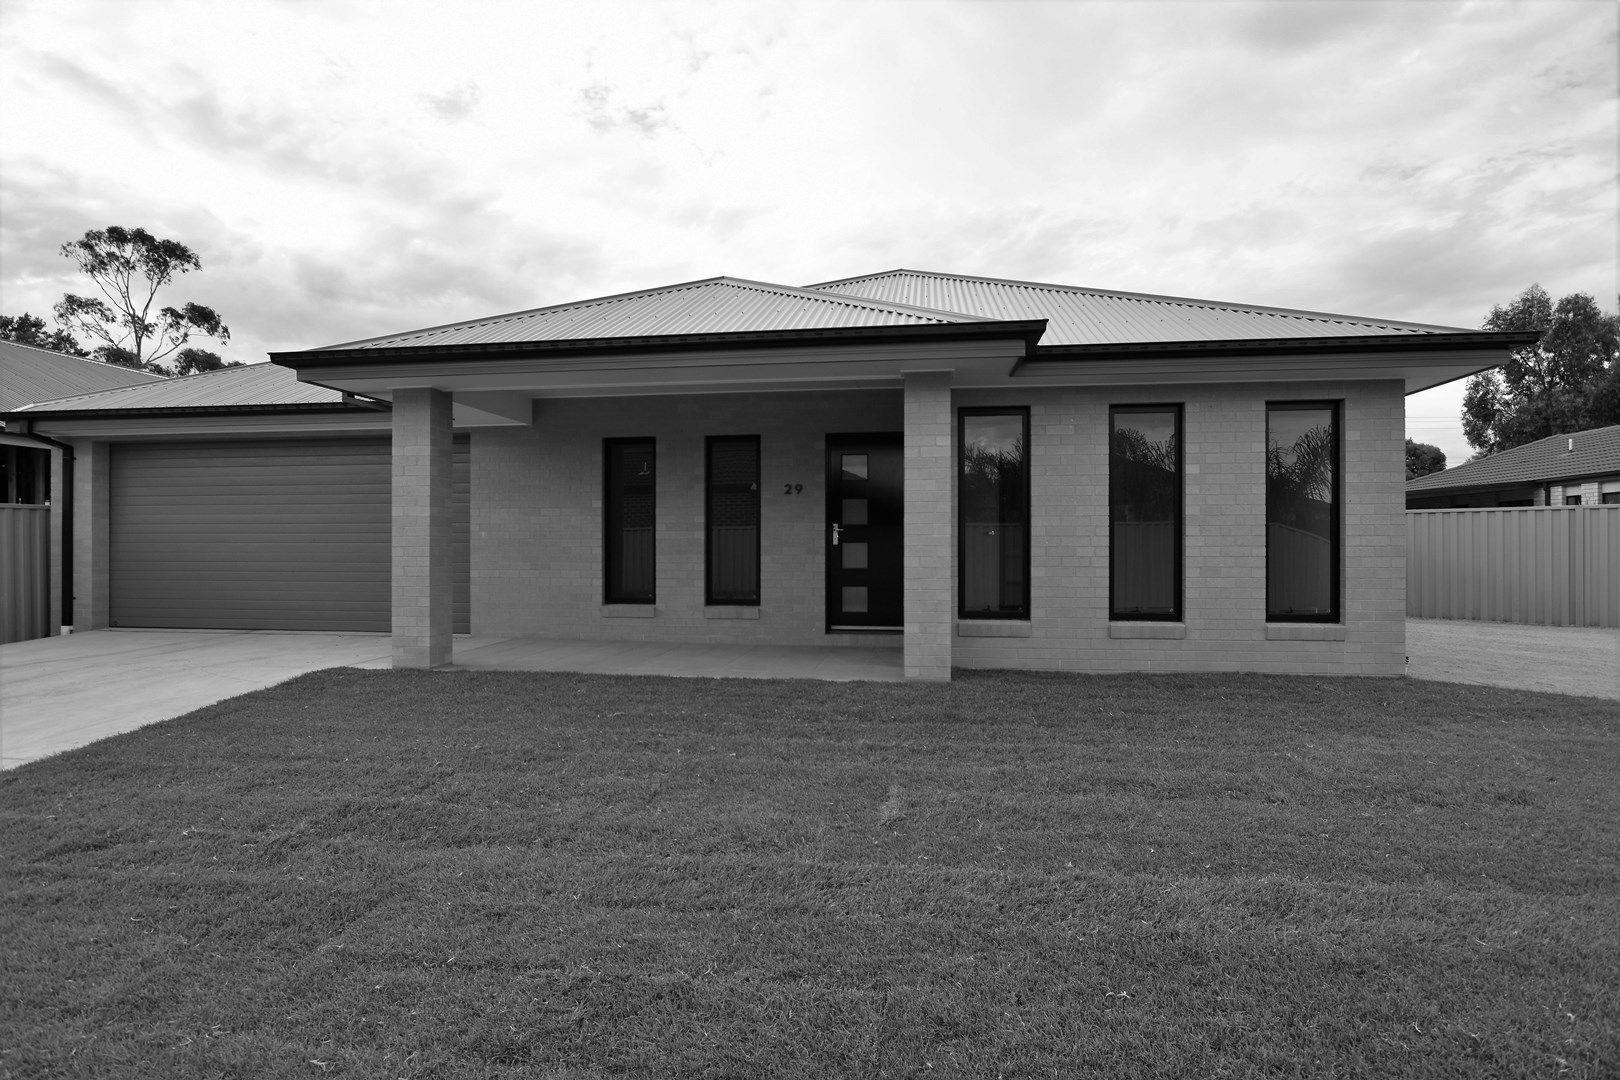 29 Struve Court, Echuca VIC 3564, Image 0